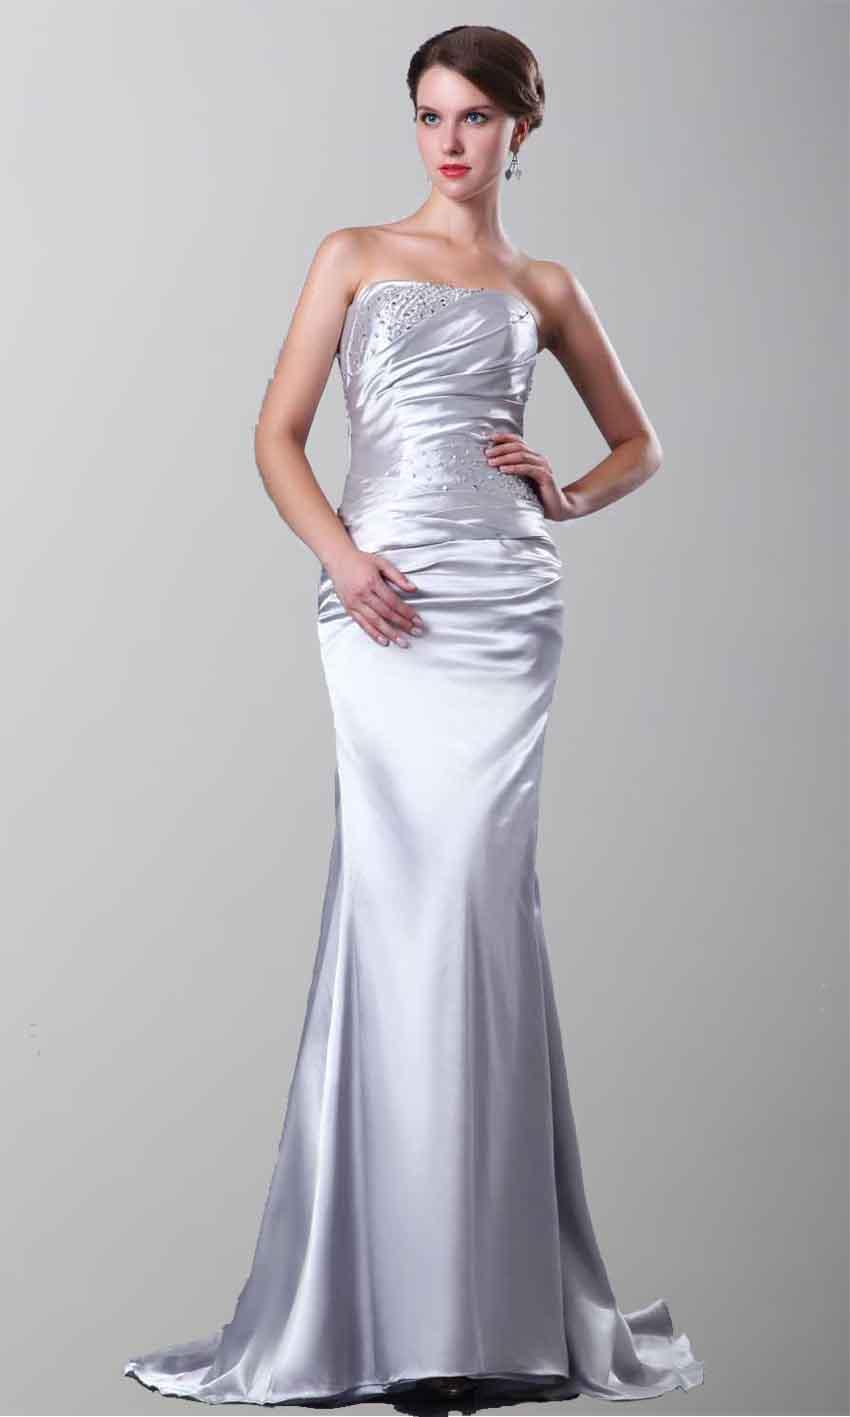 Strapless Satin Mermaid Long Grey Formal Evening Dresses KSP263 ...